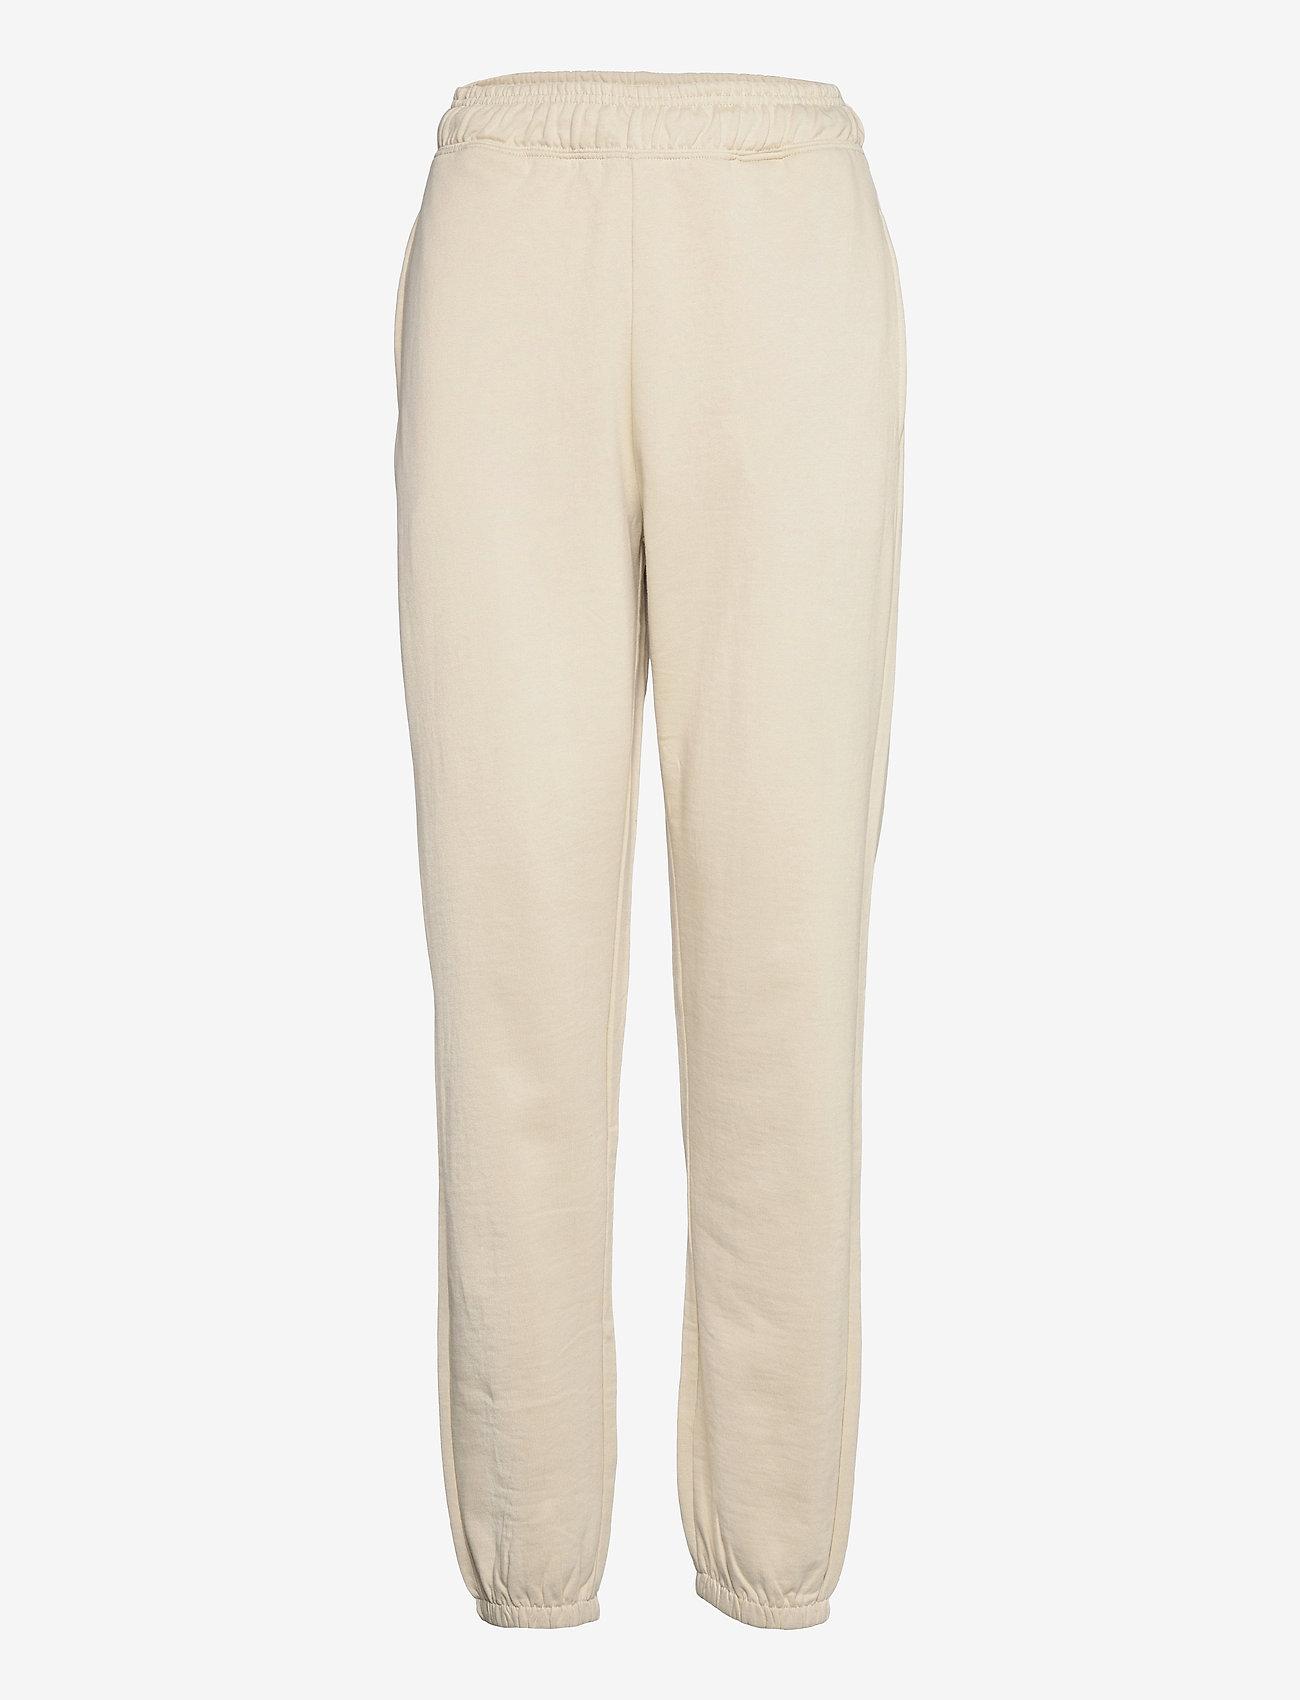 Vero Moda - VMODEZ HW SWEAT PANTS VMA - kläder - oatmeal - 0